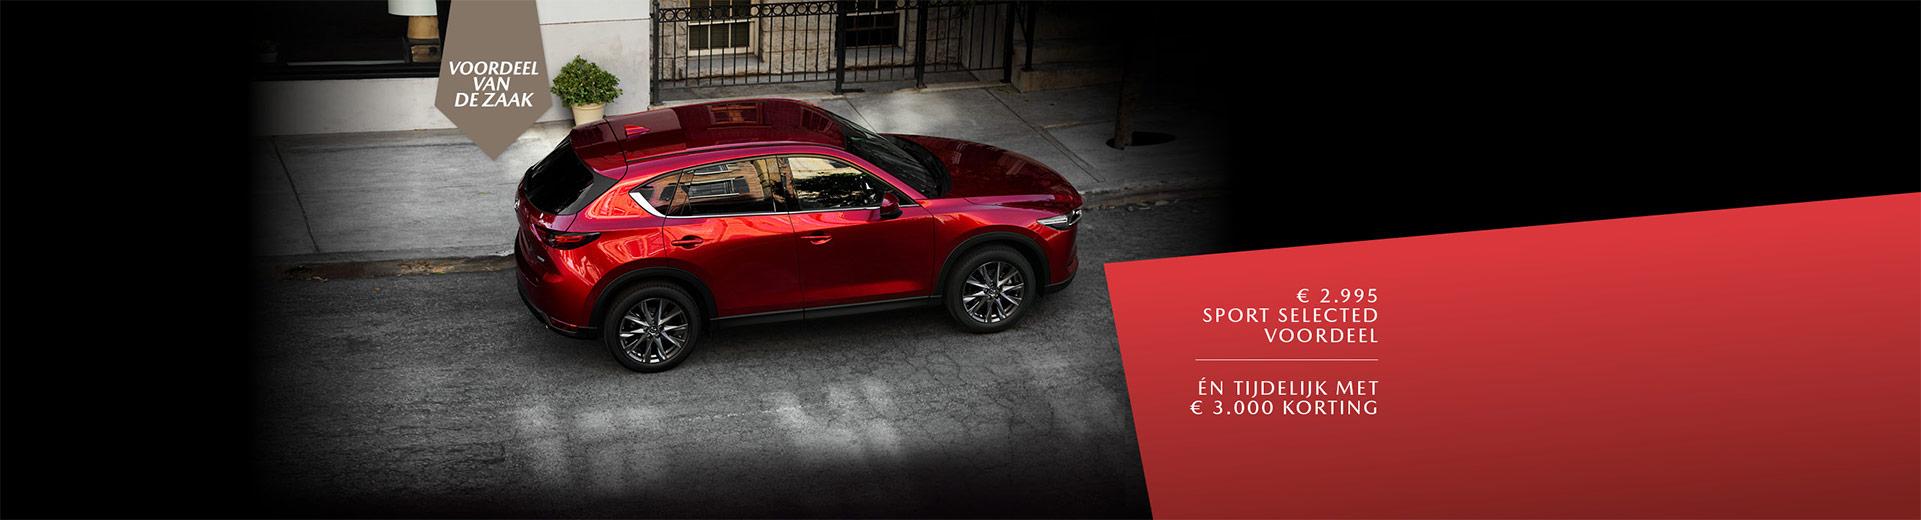 Mazda CX-5 Sport Selected